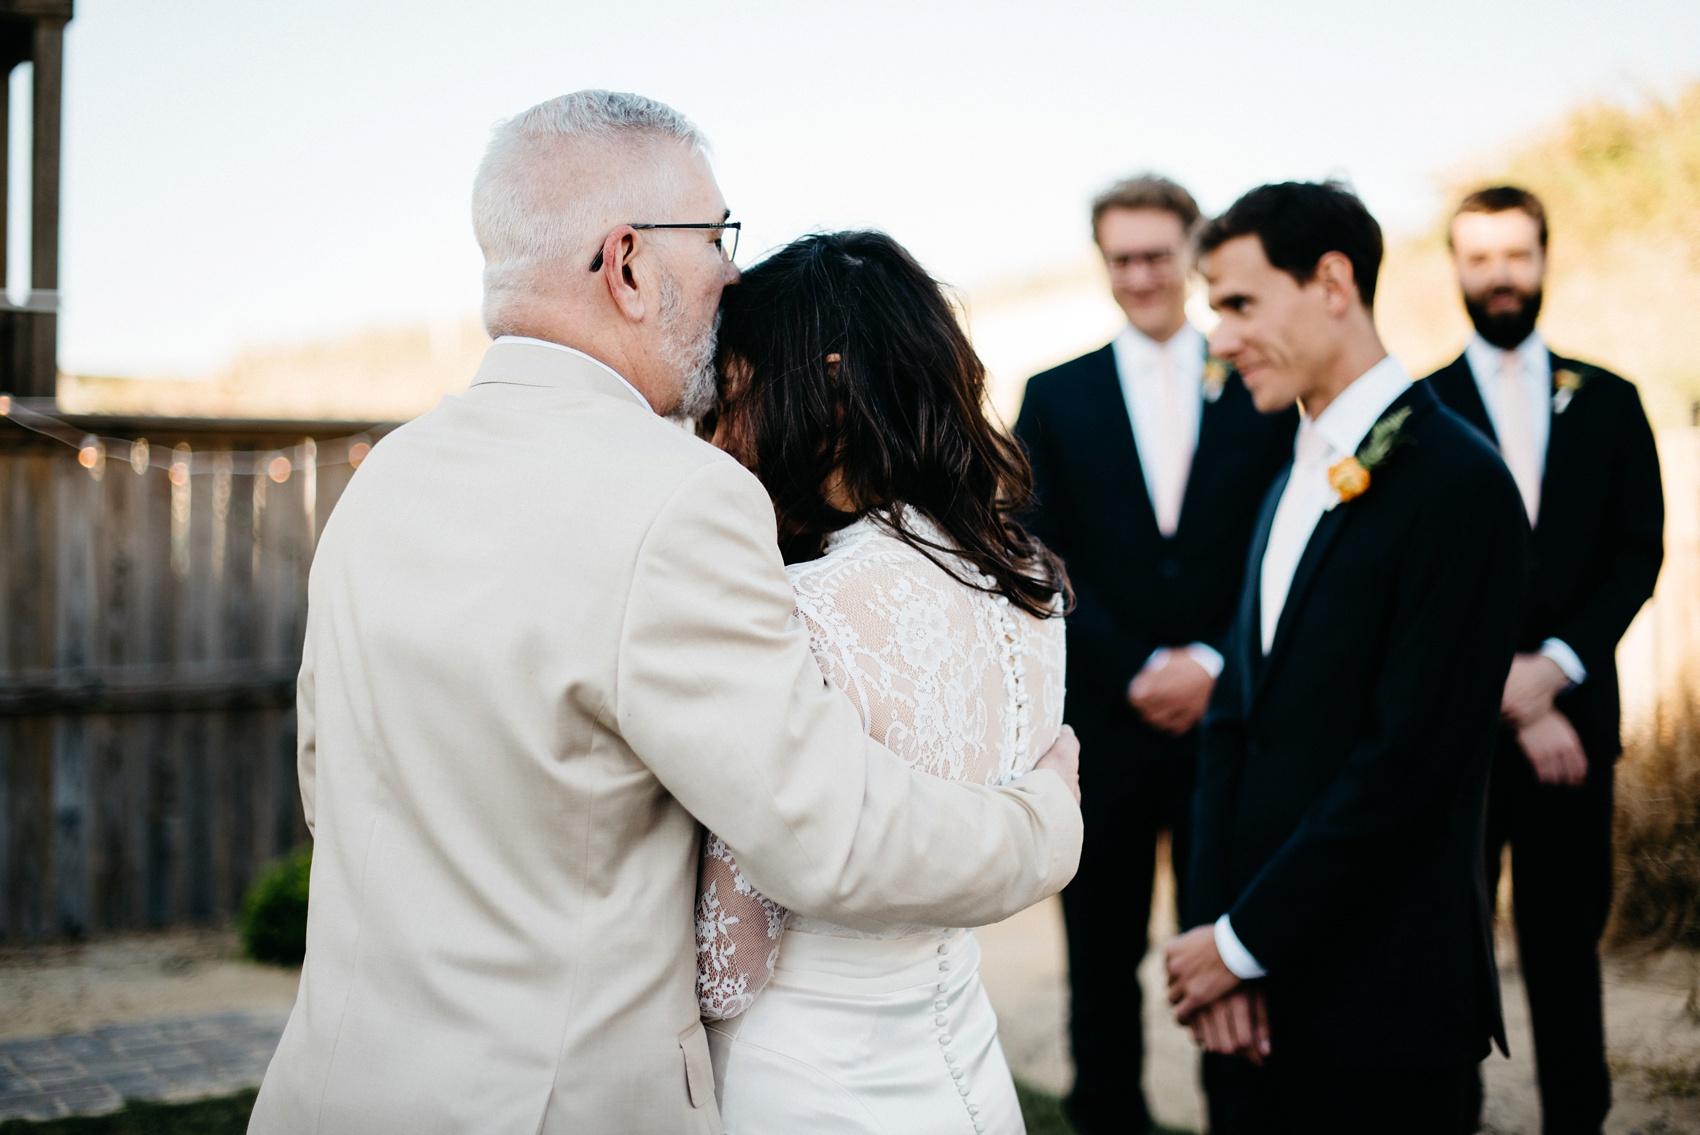 outerbanks_wedding_photographer_1277.jpg